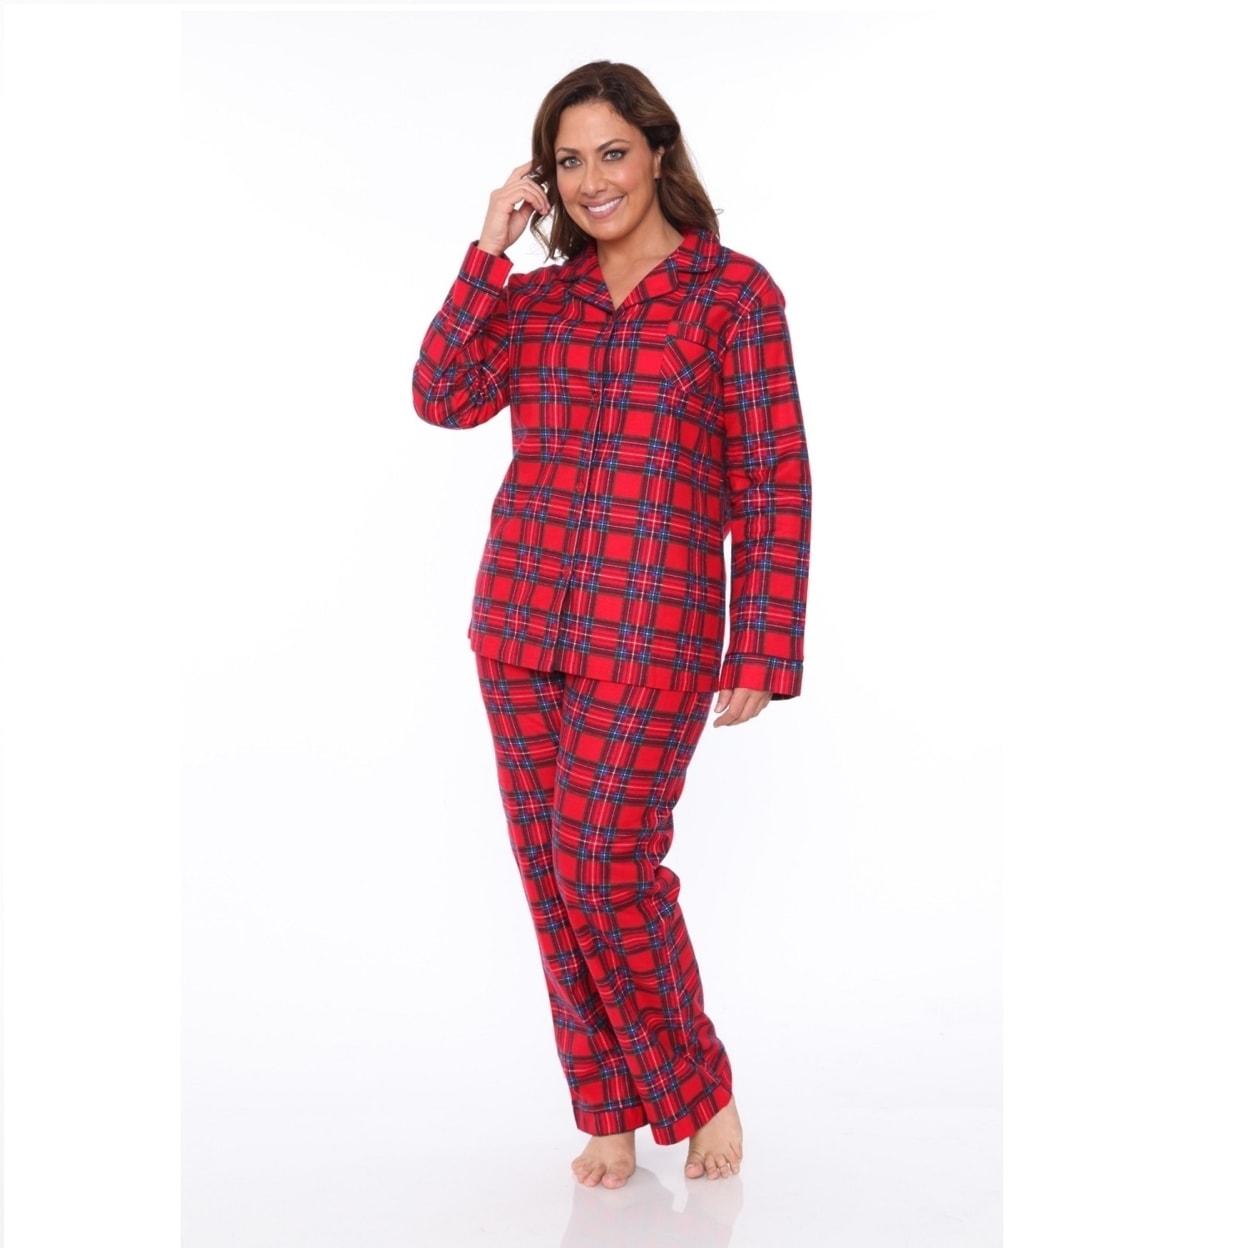 40e6b2cc19 Shop Plus Size Flannel Pajama Set - Red Plaid - On Sale - Free ...